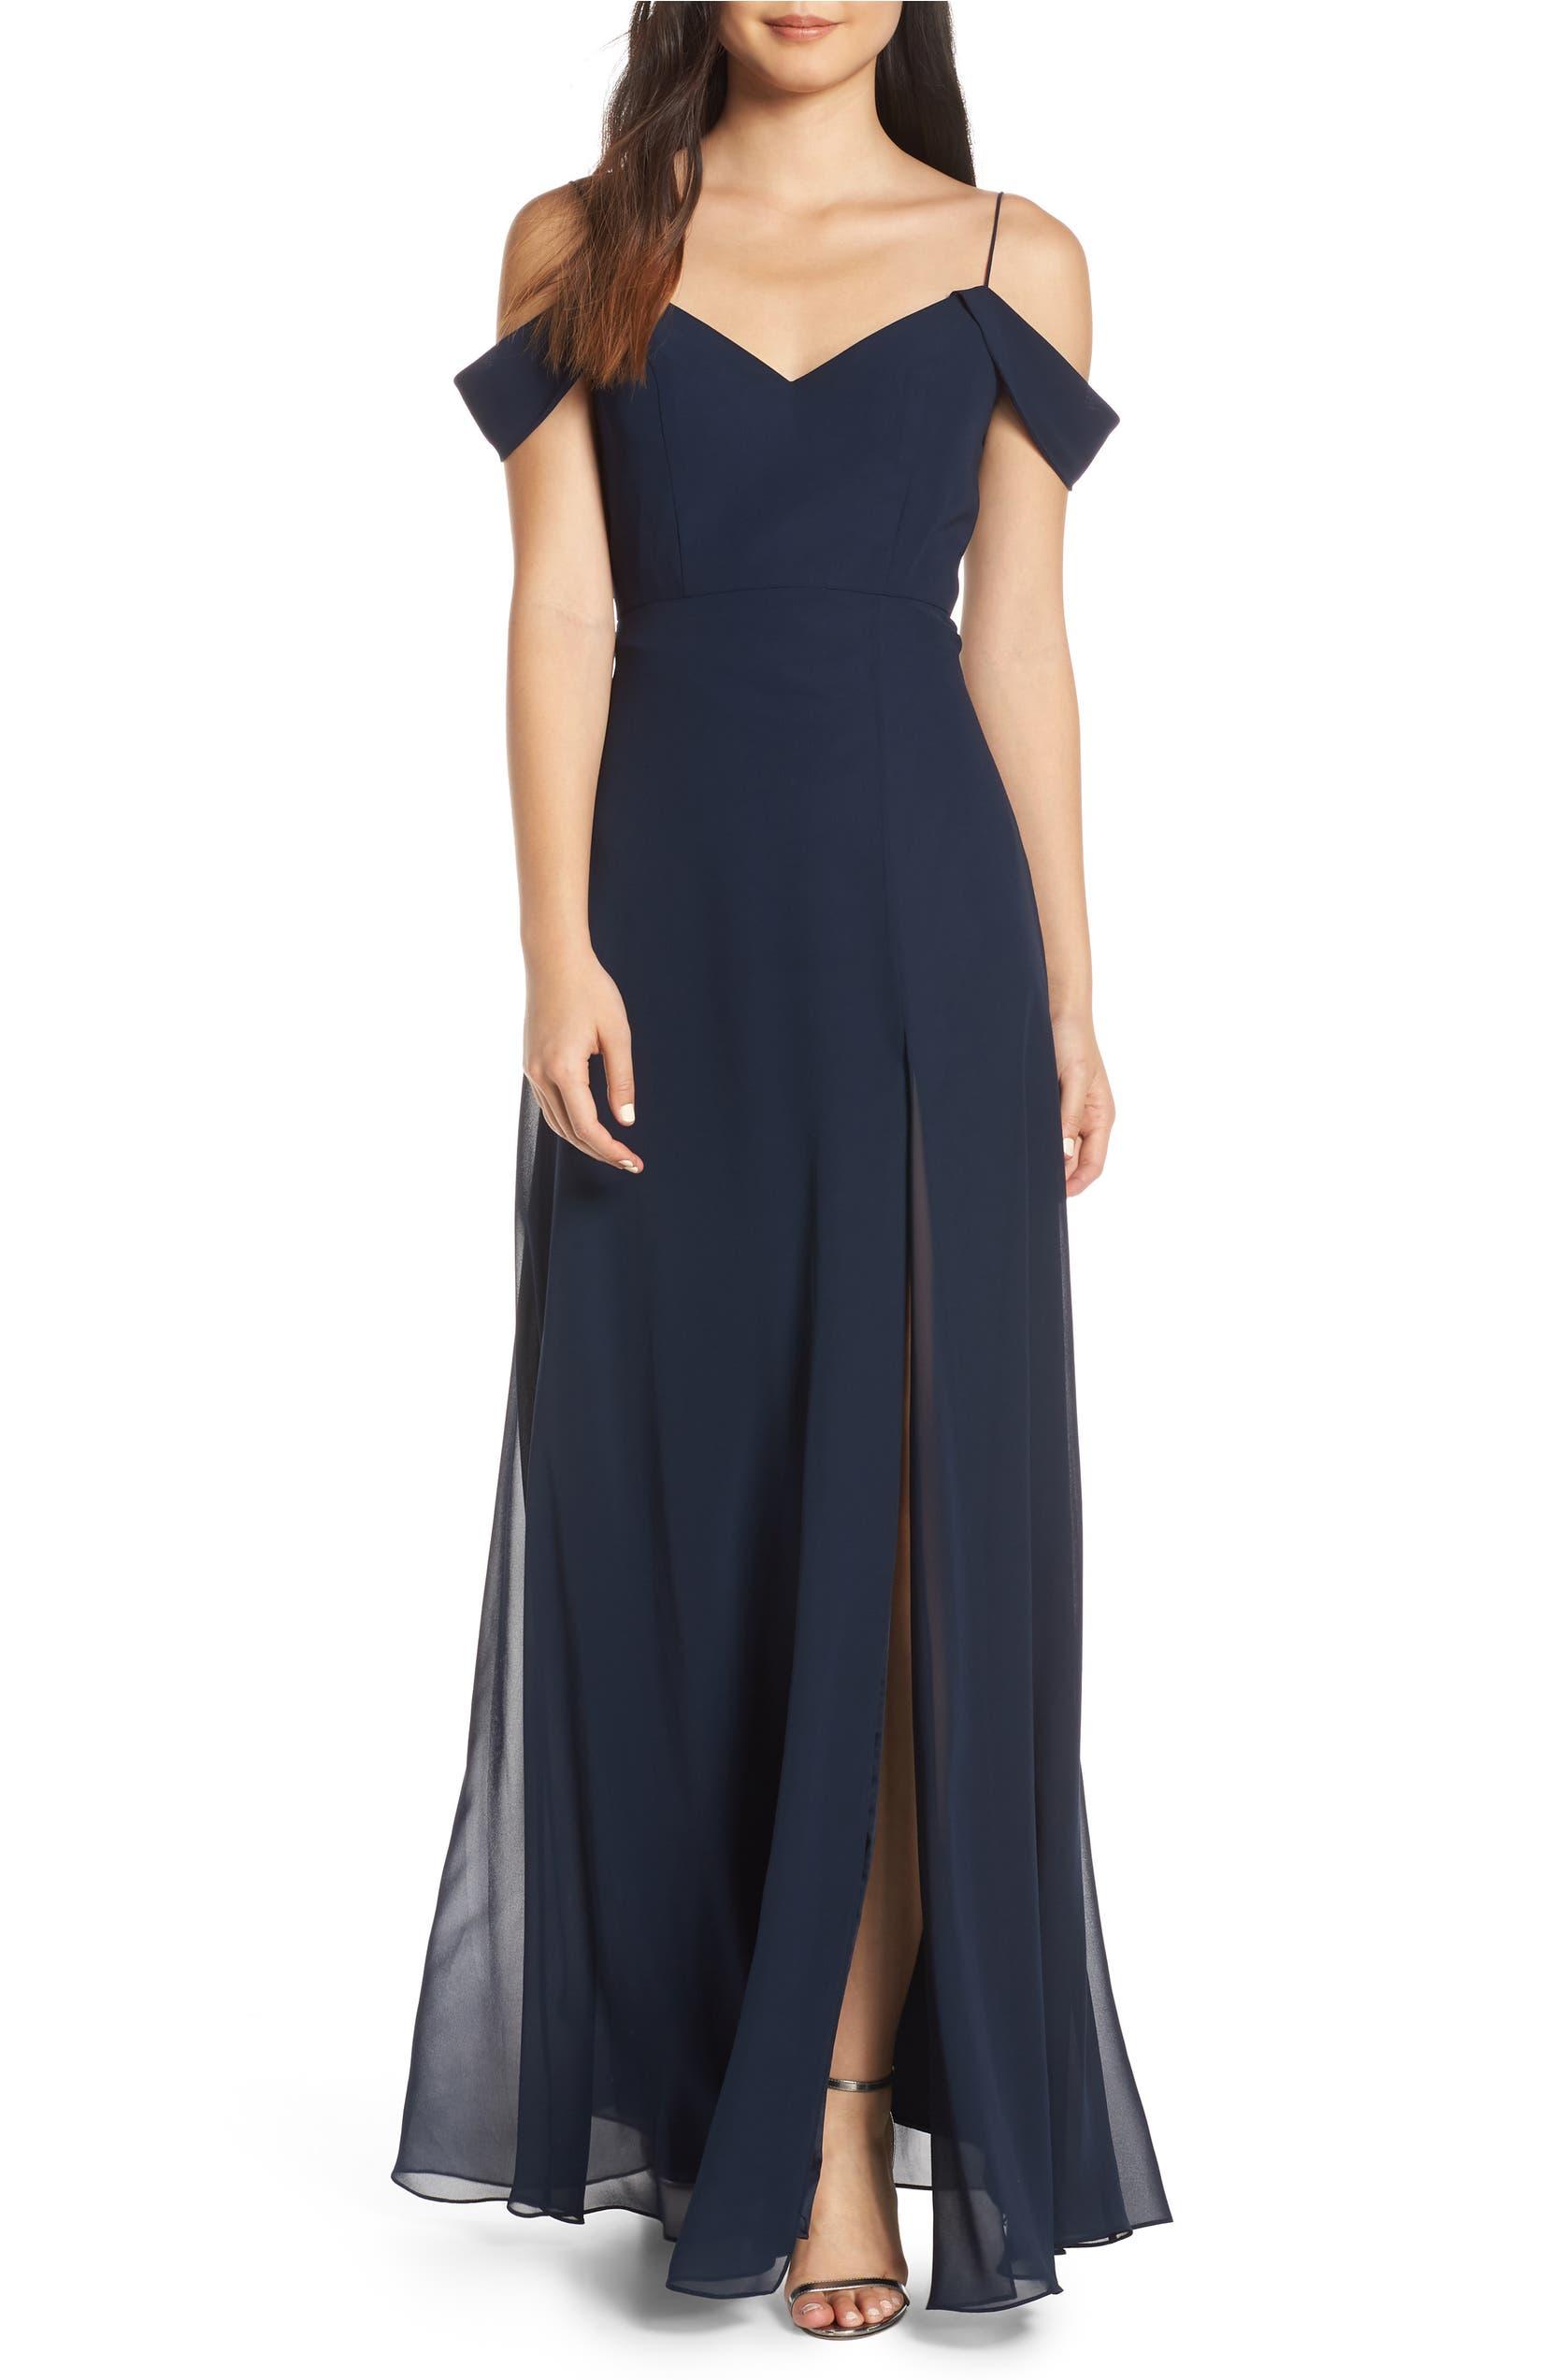 0ace699dba8c Jenny Yoo Priya Cold Shoulder Chiffon Evening Dress | Nordstrom